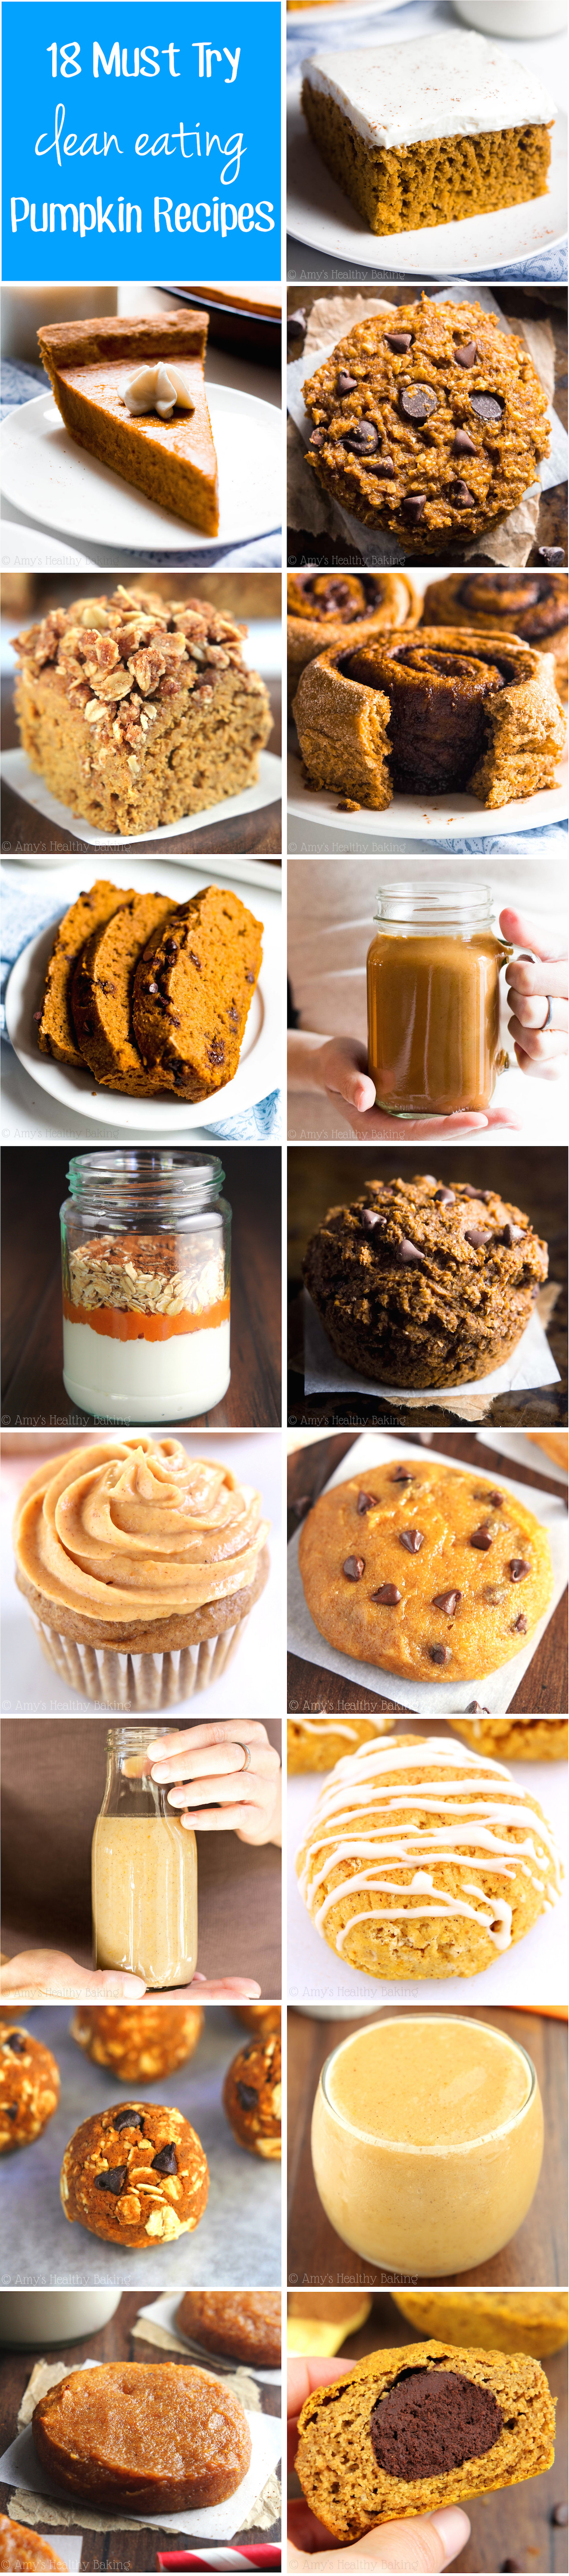 Healthy Canned Pumpkin Dessert Recipes  healthy canned pumpkin recipes